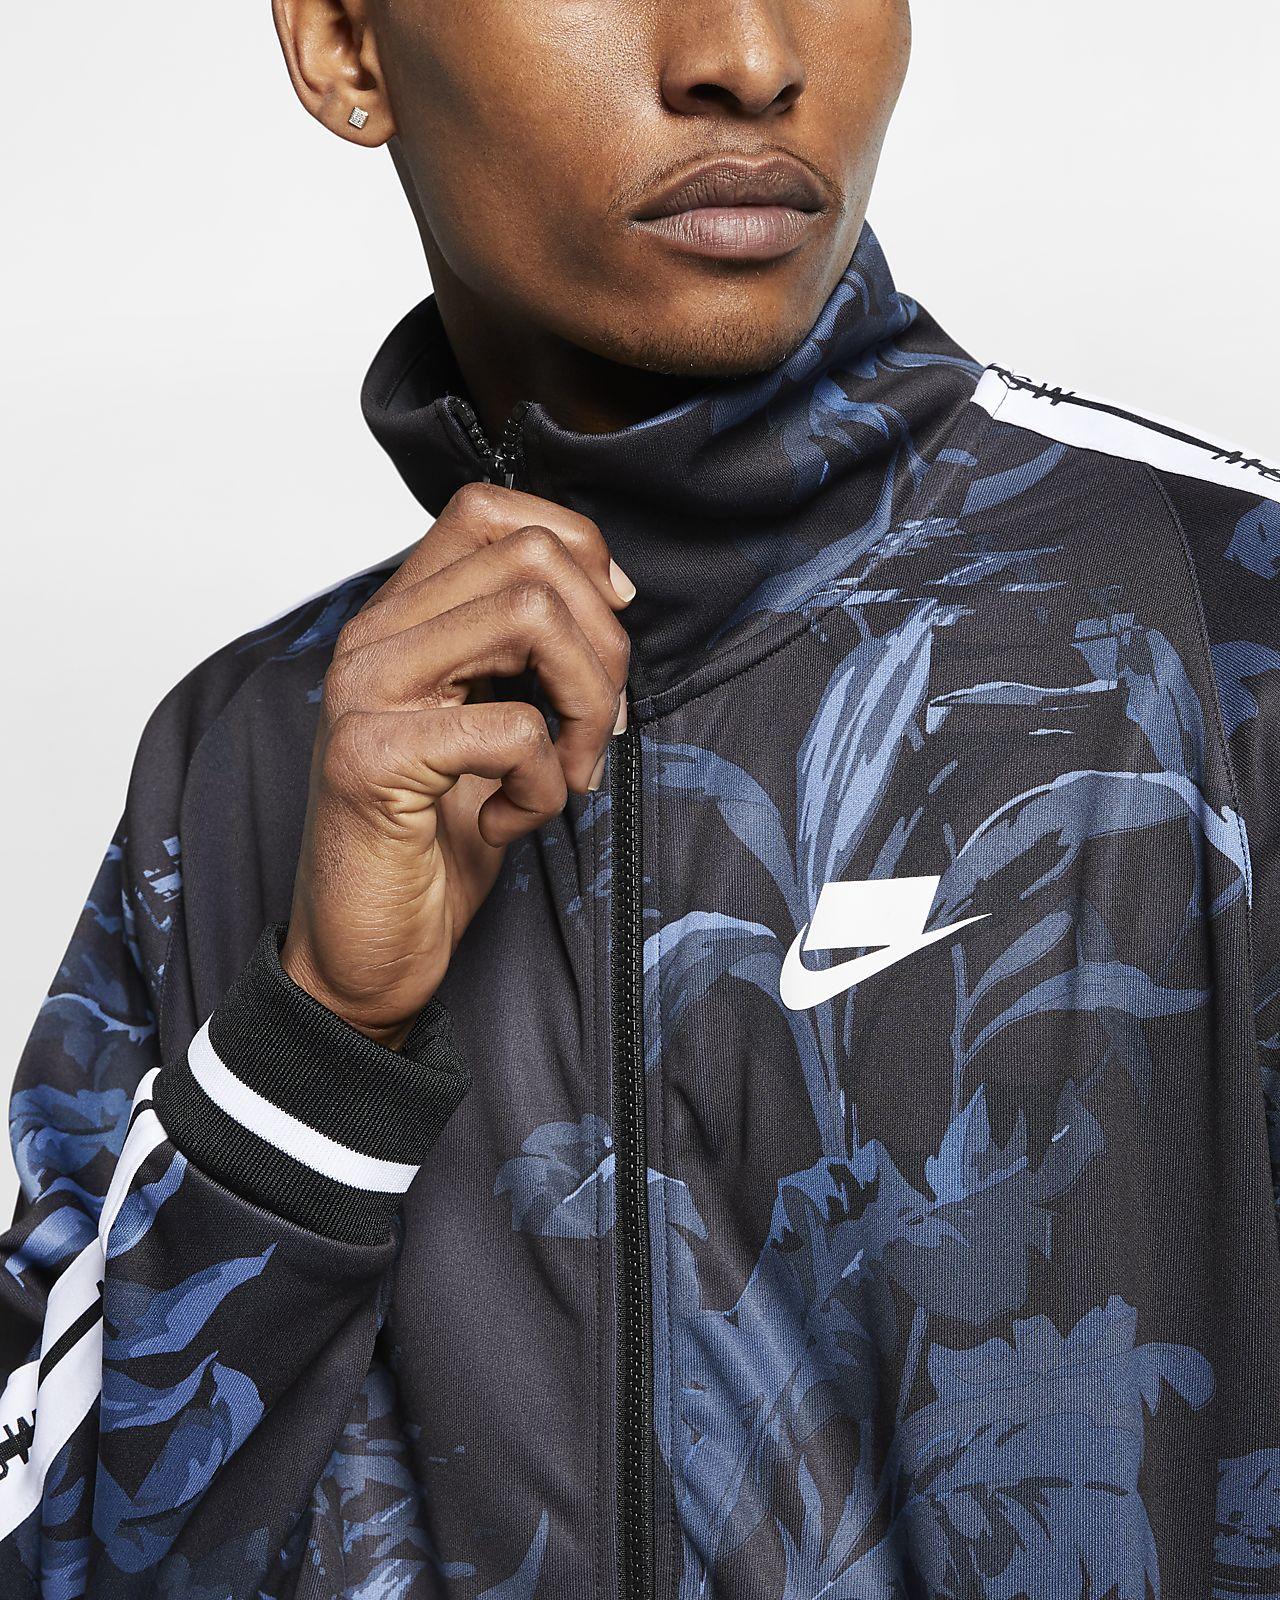 NSW WMNS NIKE EBERNON LOW | Nike outfits, Nike sportswear